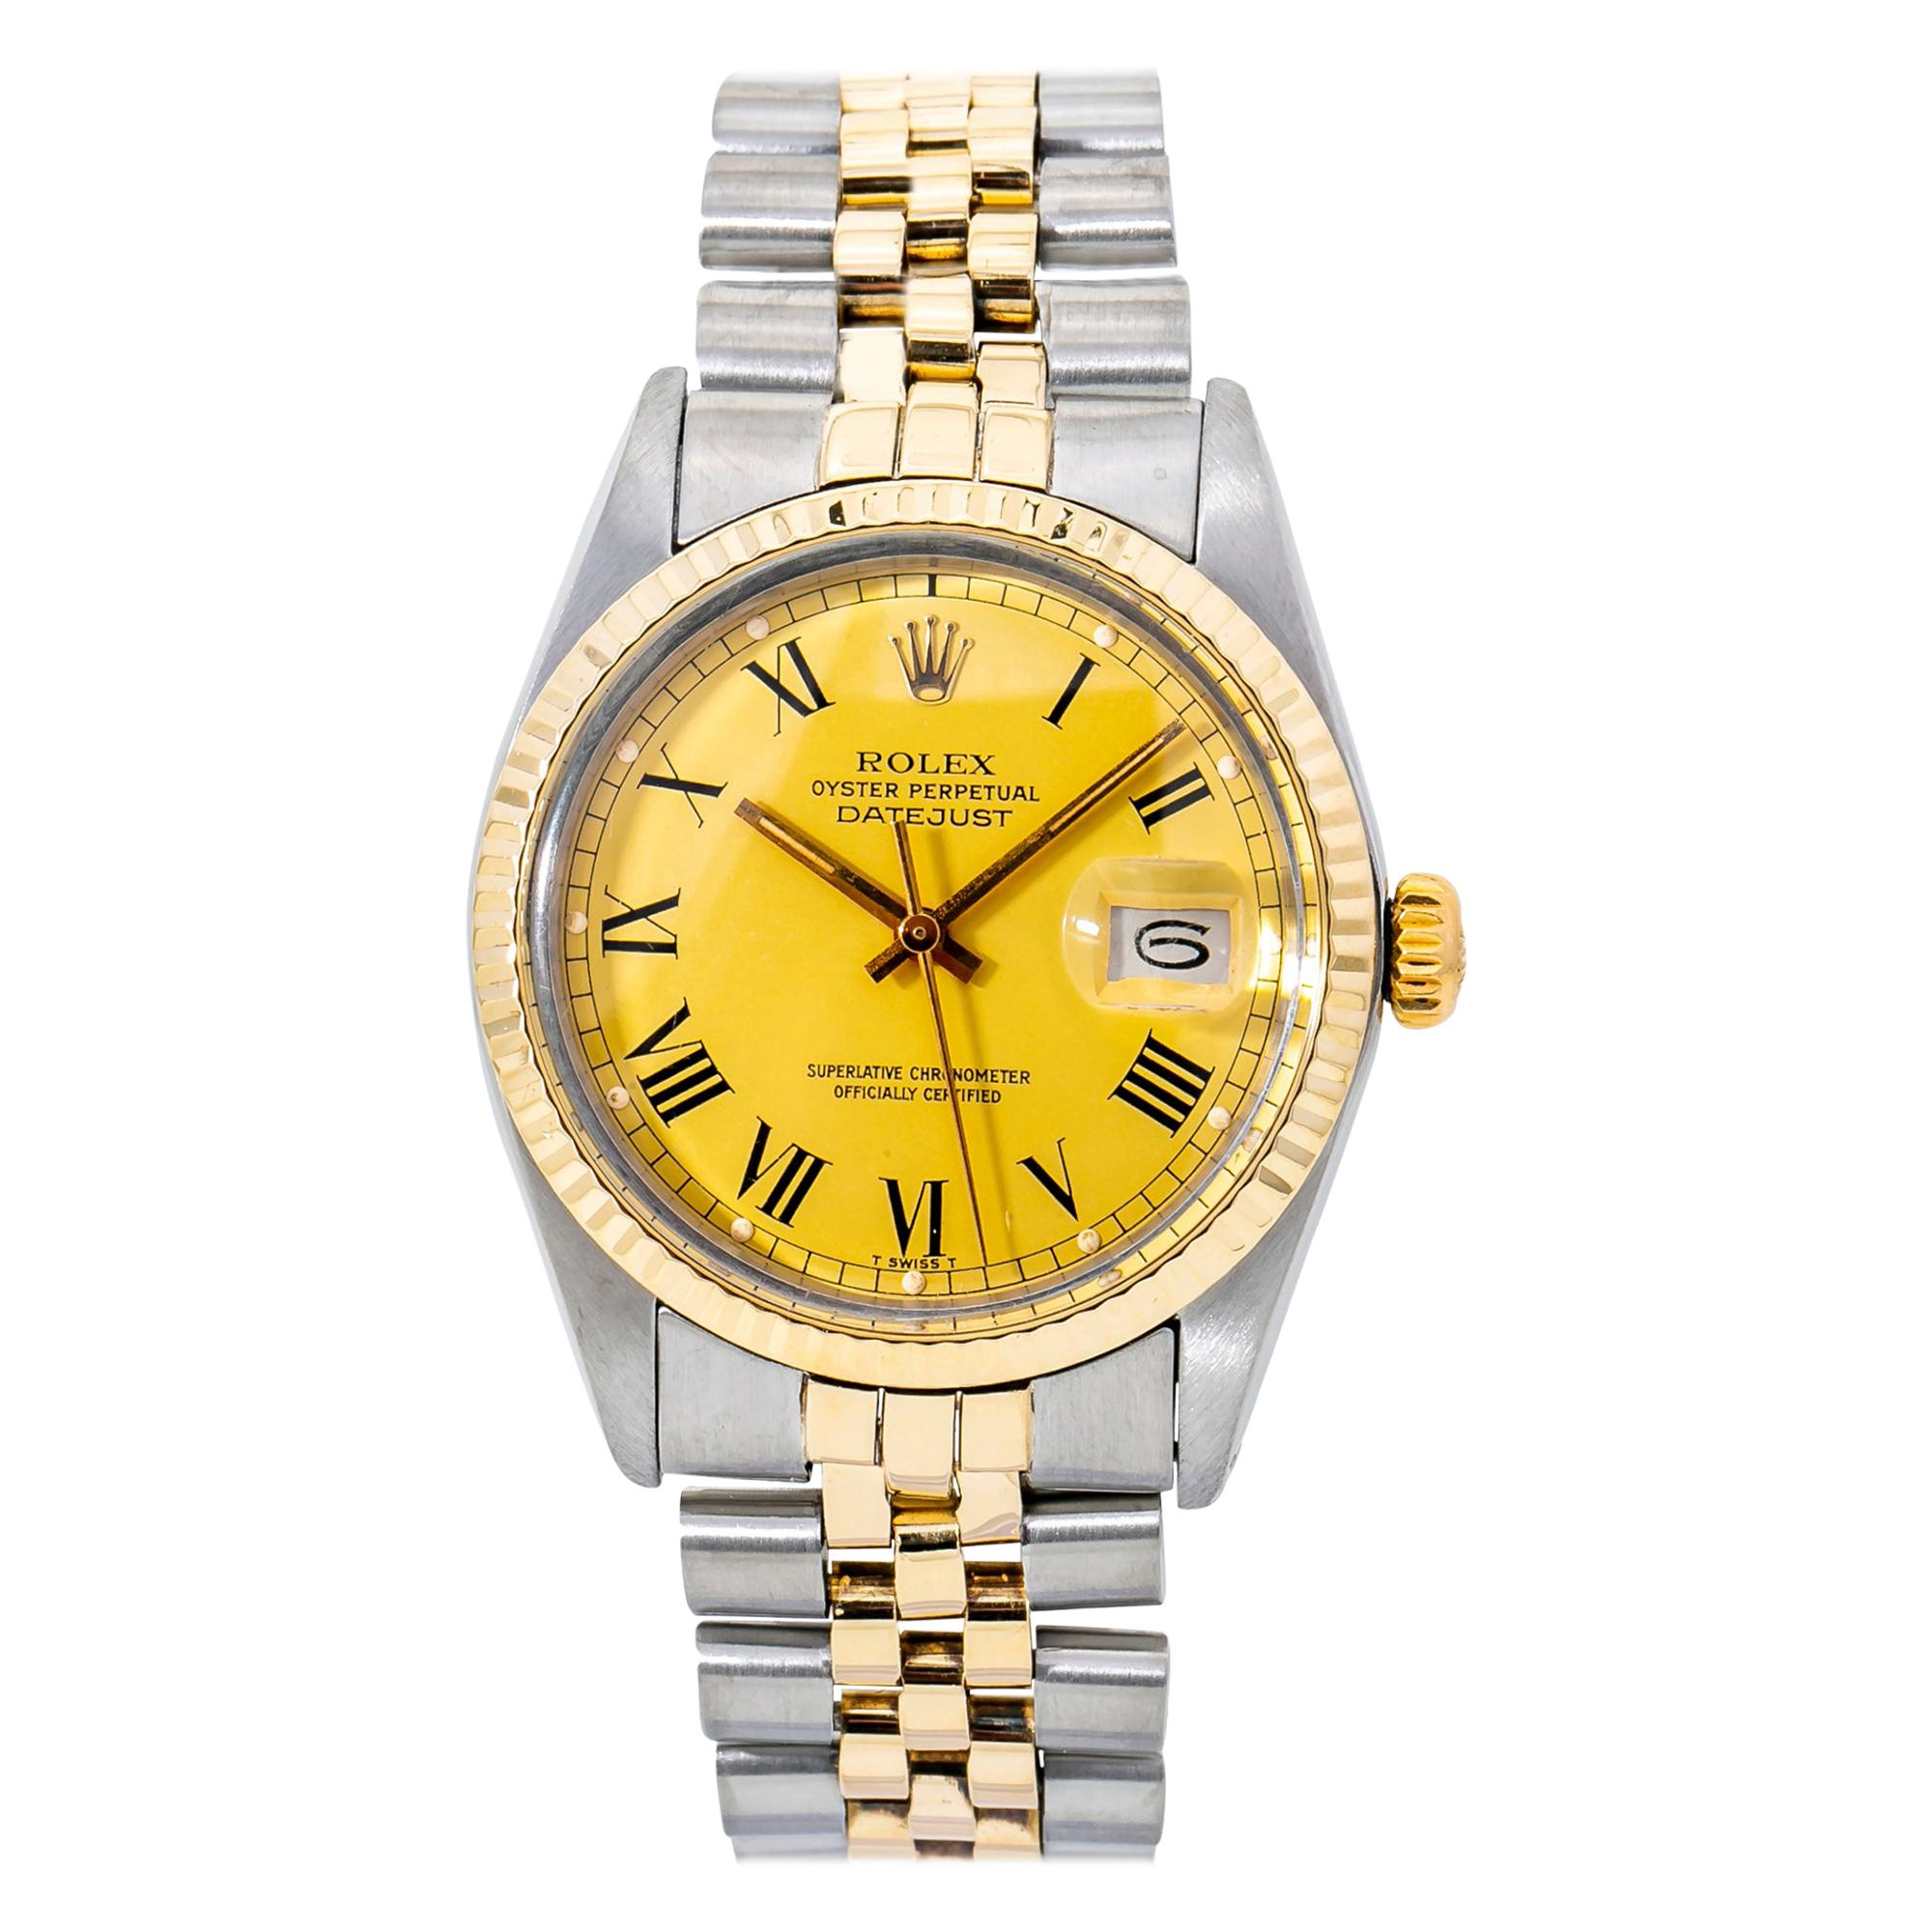 Rolex Datejust 16013 Men's Automatic Watch Two-Tone 18K YG